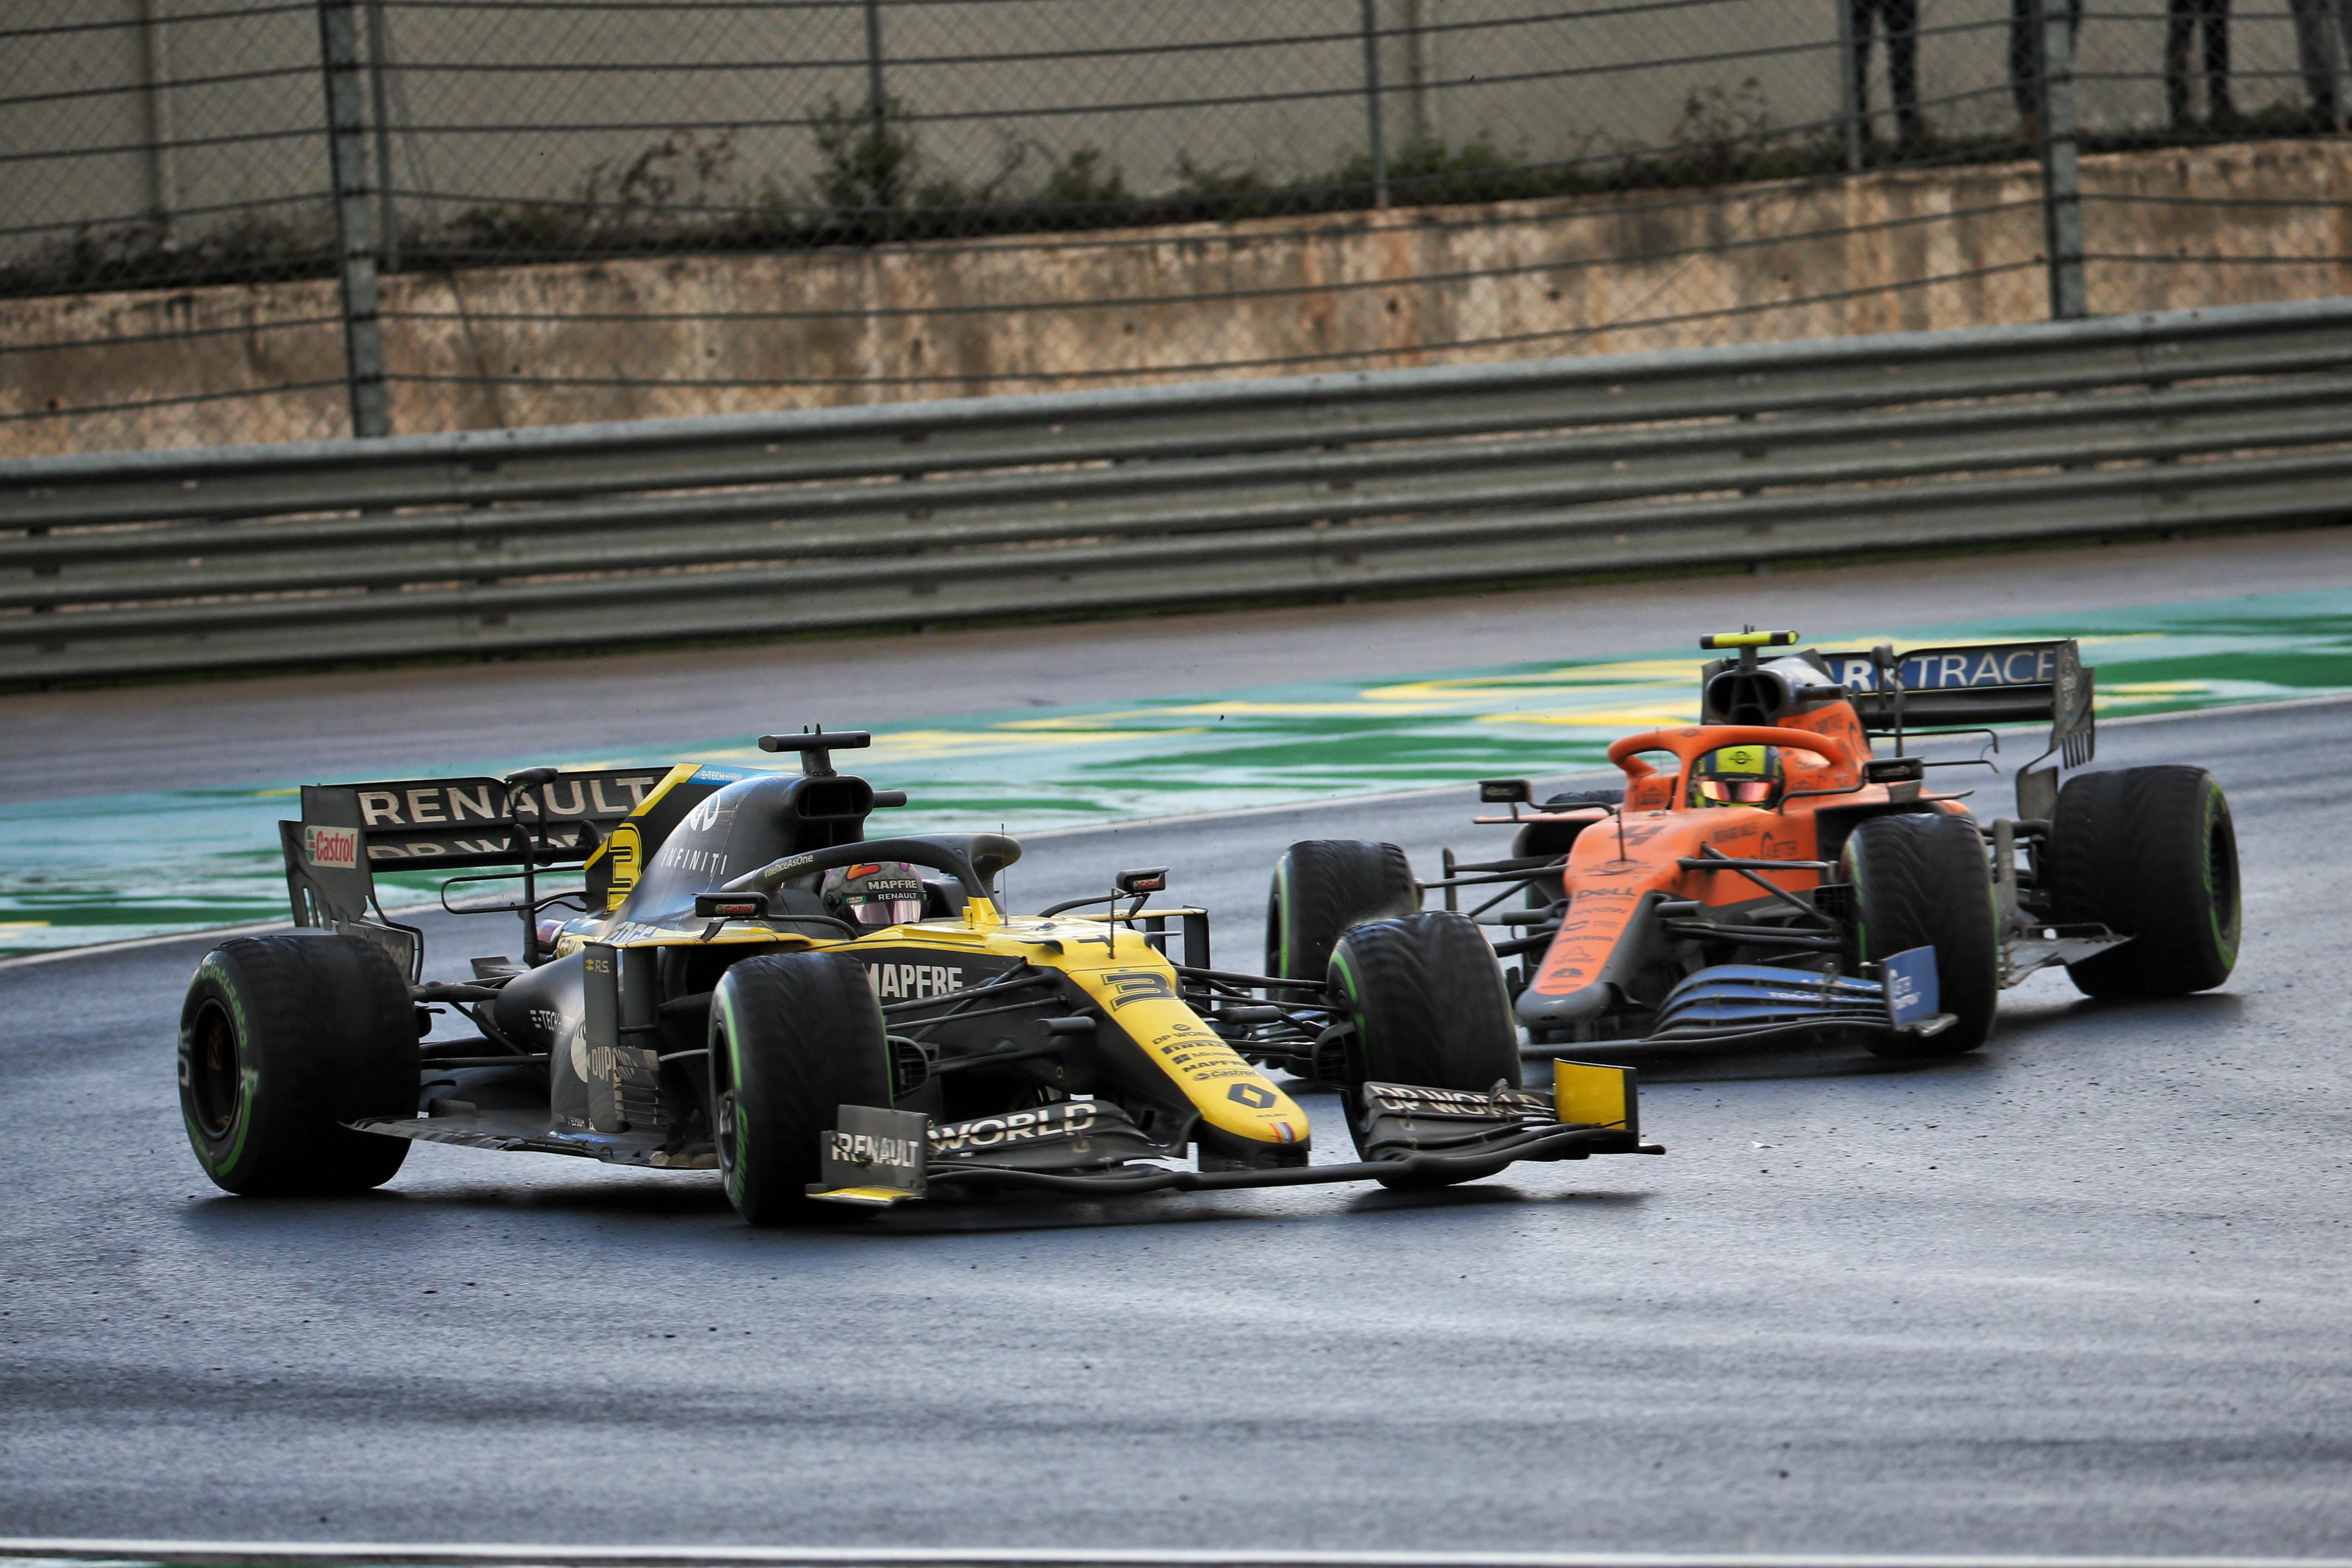 Daniel Ricciardo Renault Lando Norris McLaren Turkish Grand Prix 2020 Istanbul